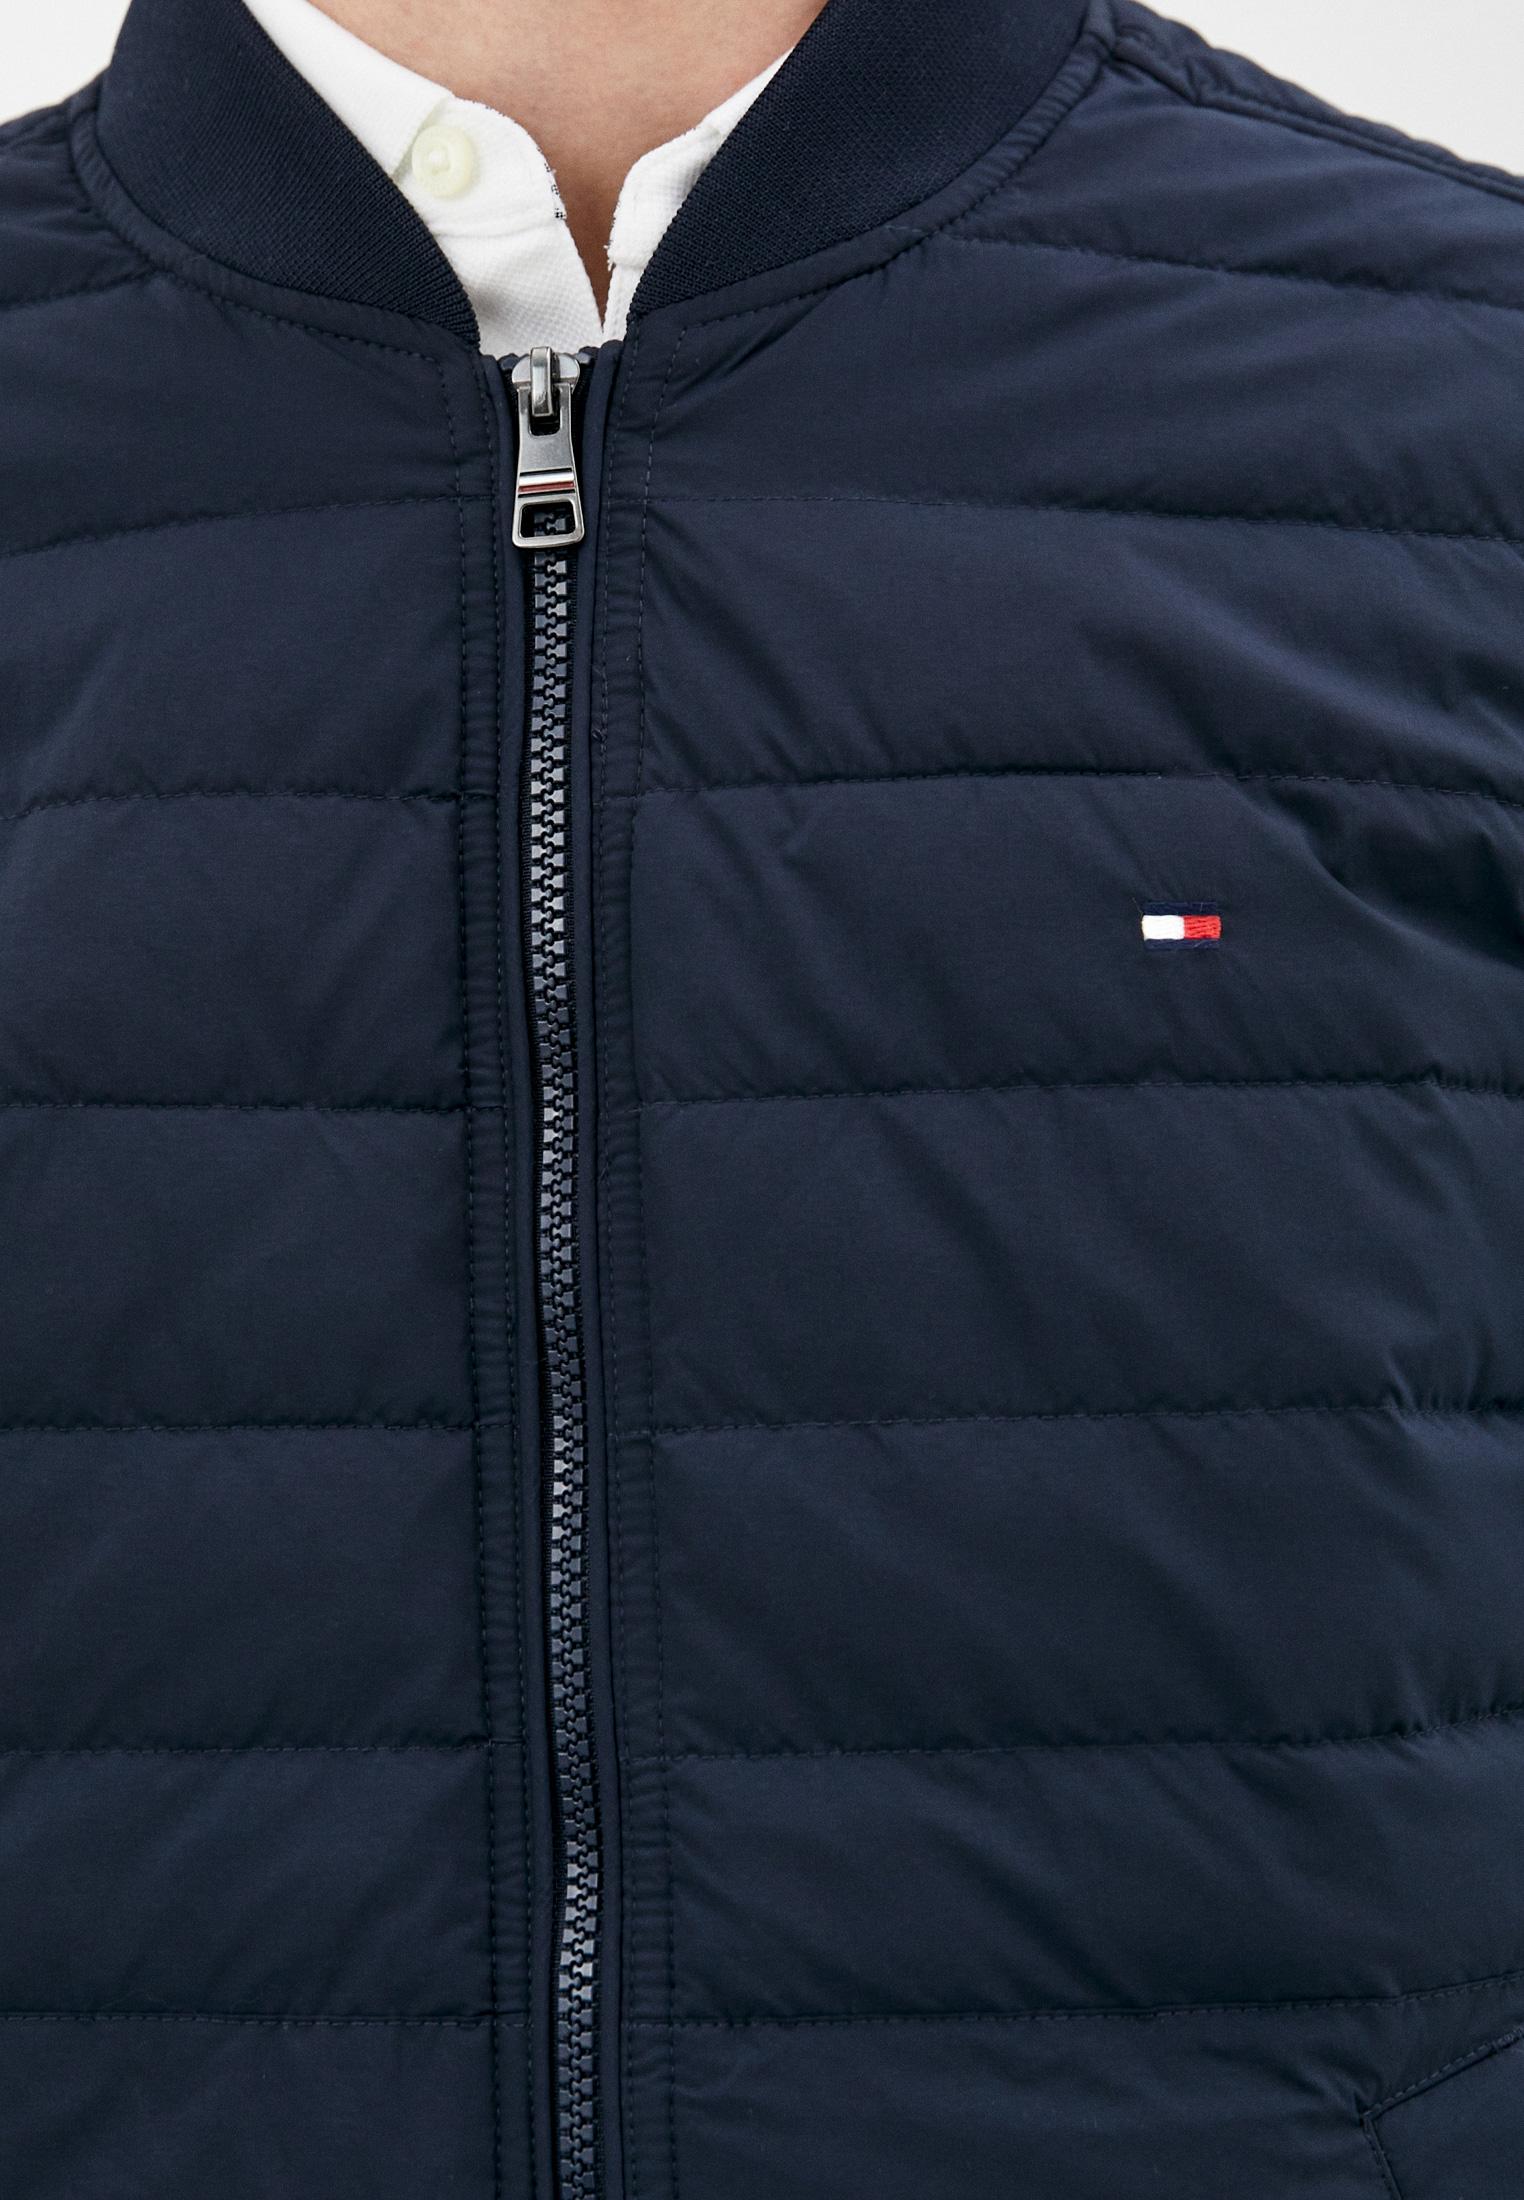 Куртка Tommy Hilfiger (Томми Хилфигер) MW0MW15896: изображение 5